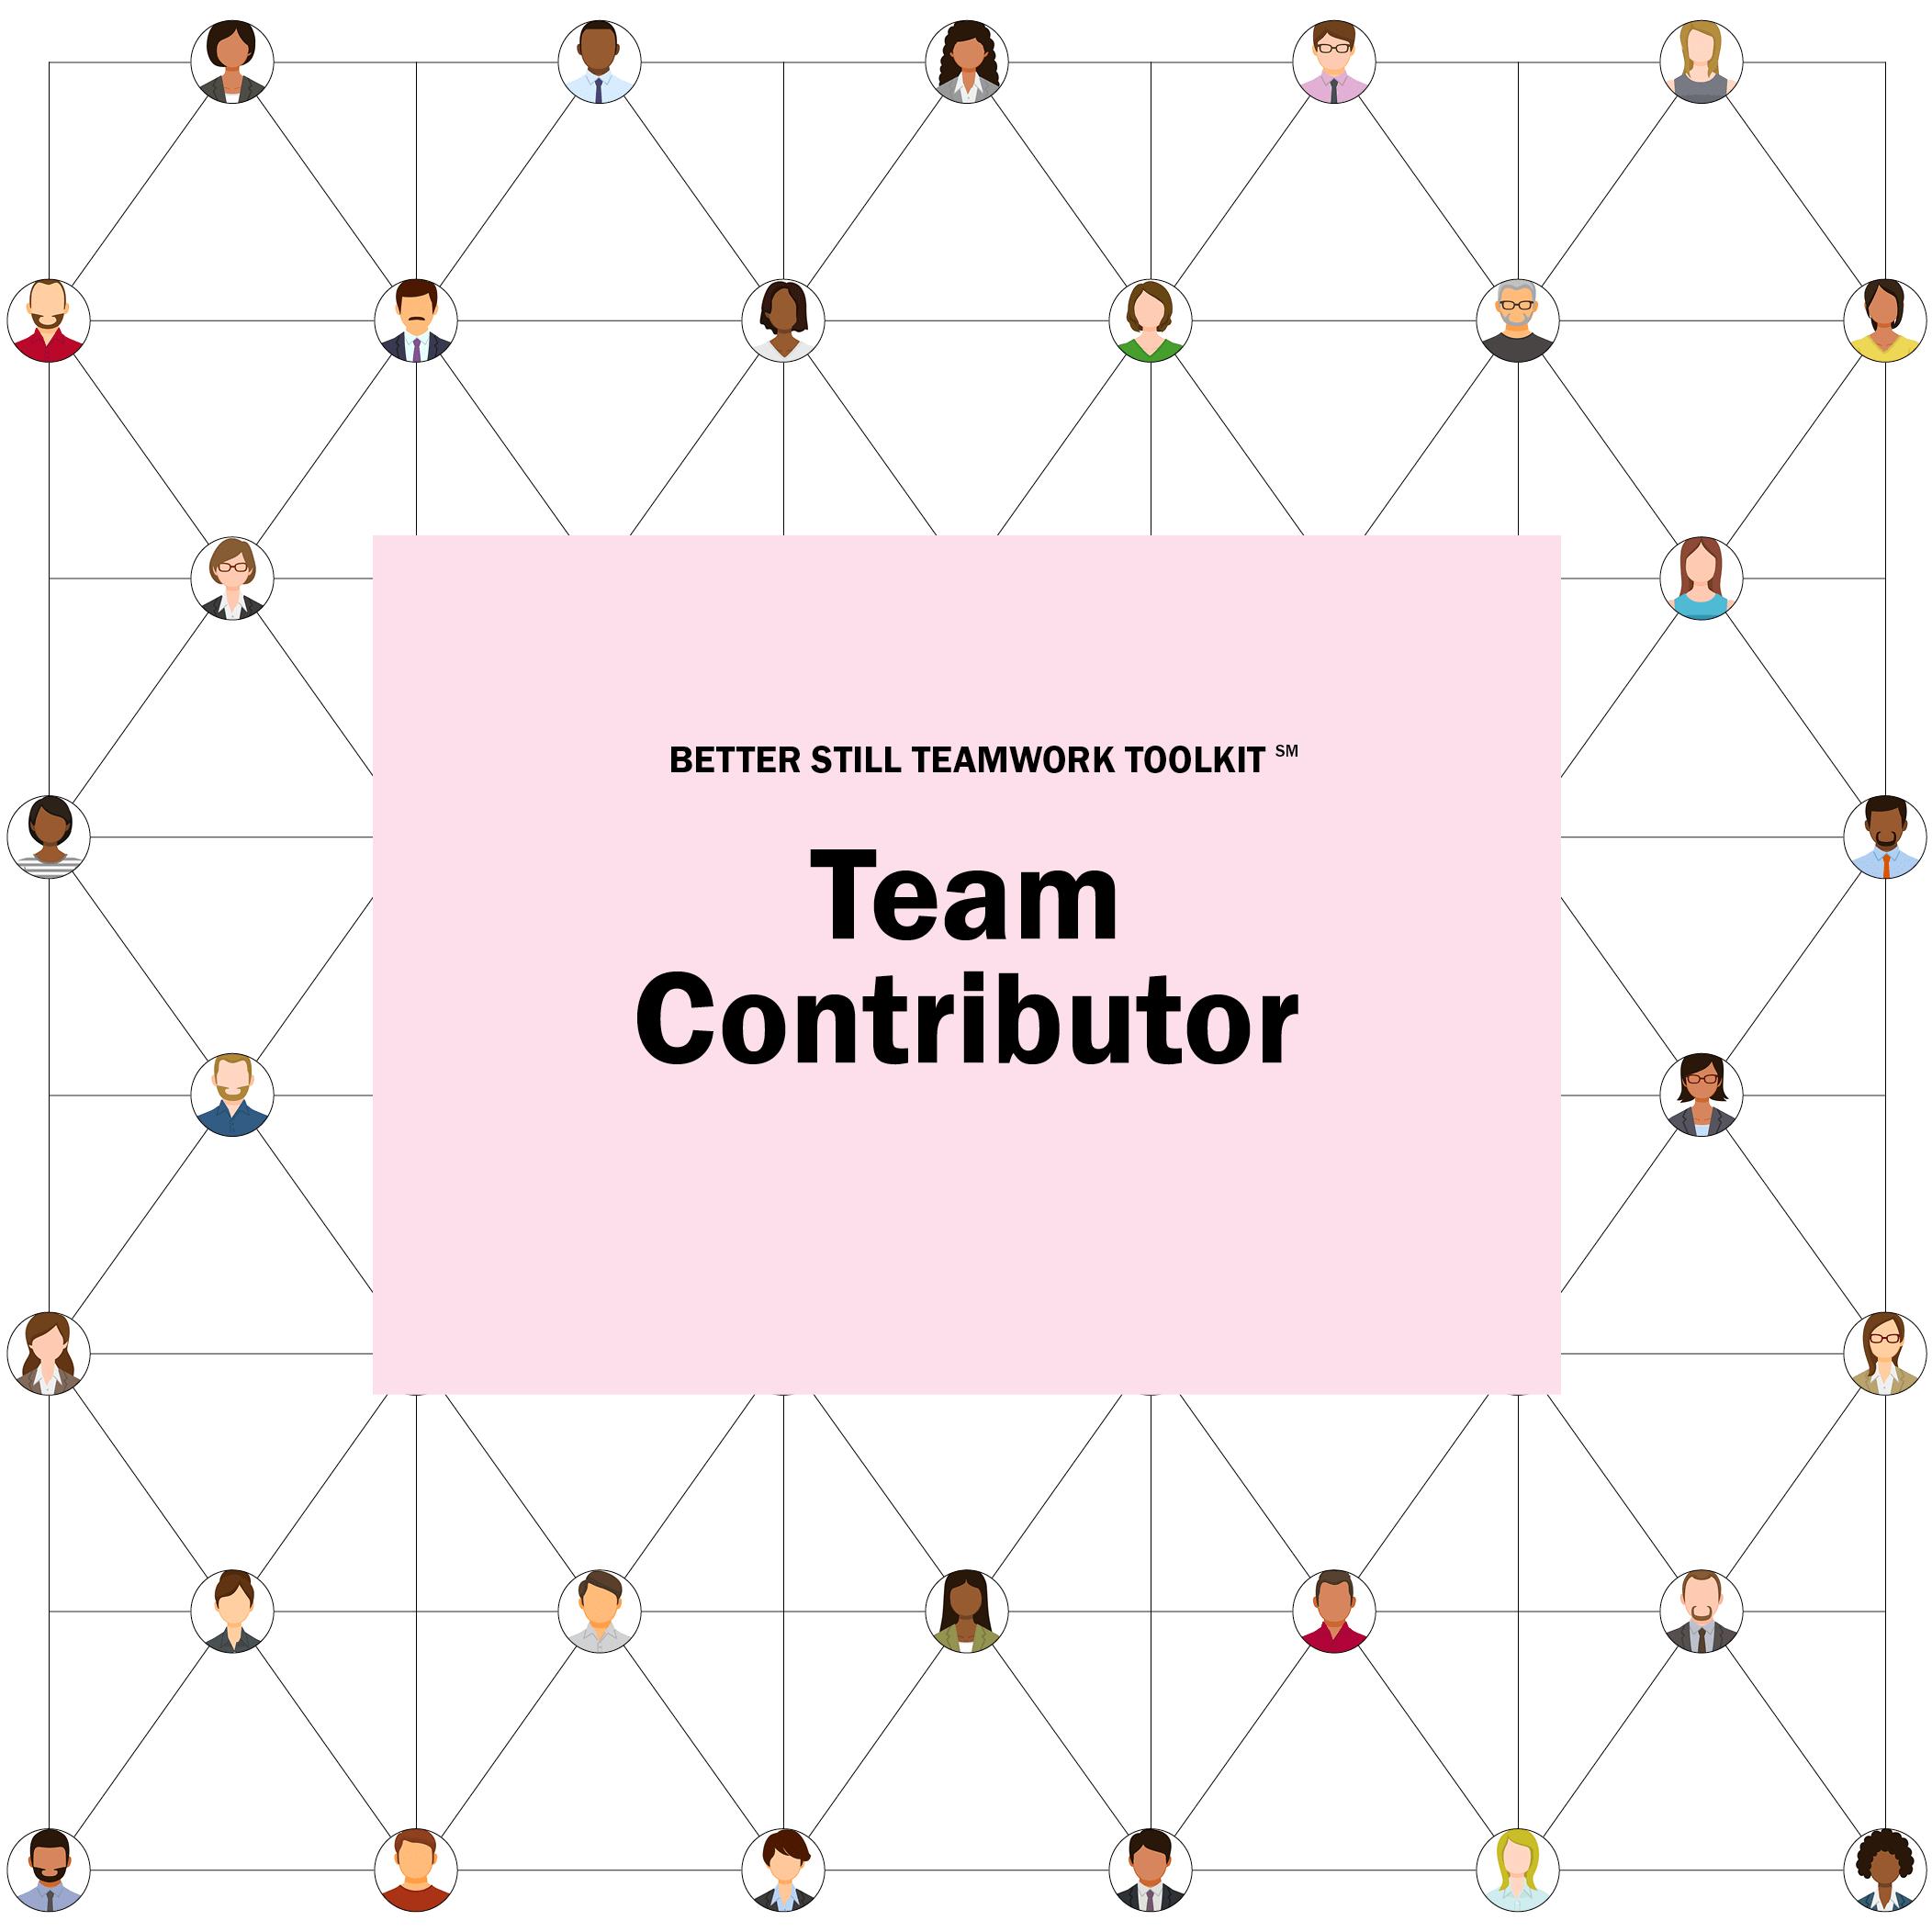 Better Still Teamwork Toolkit—Team Contributor